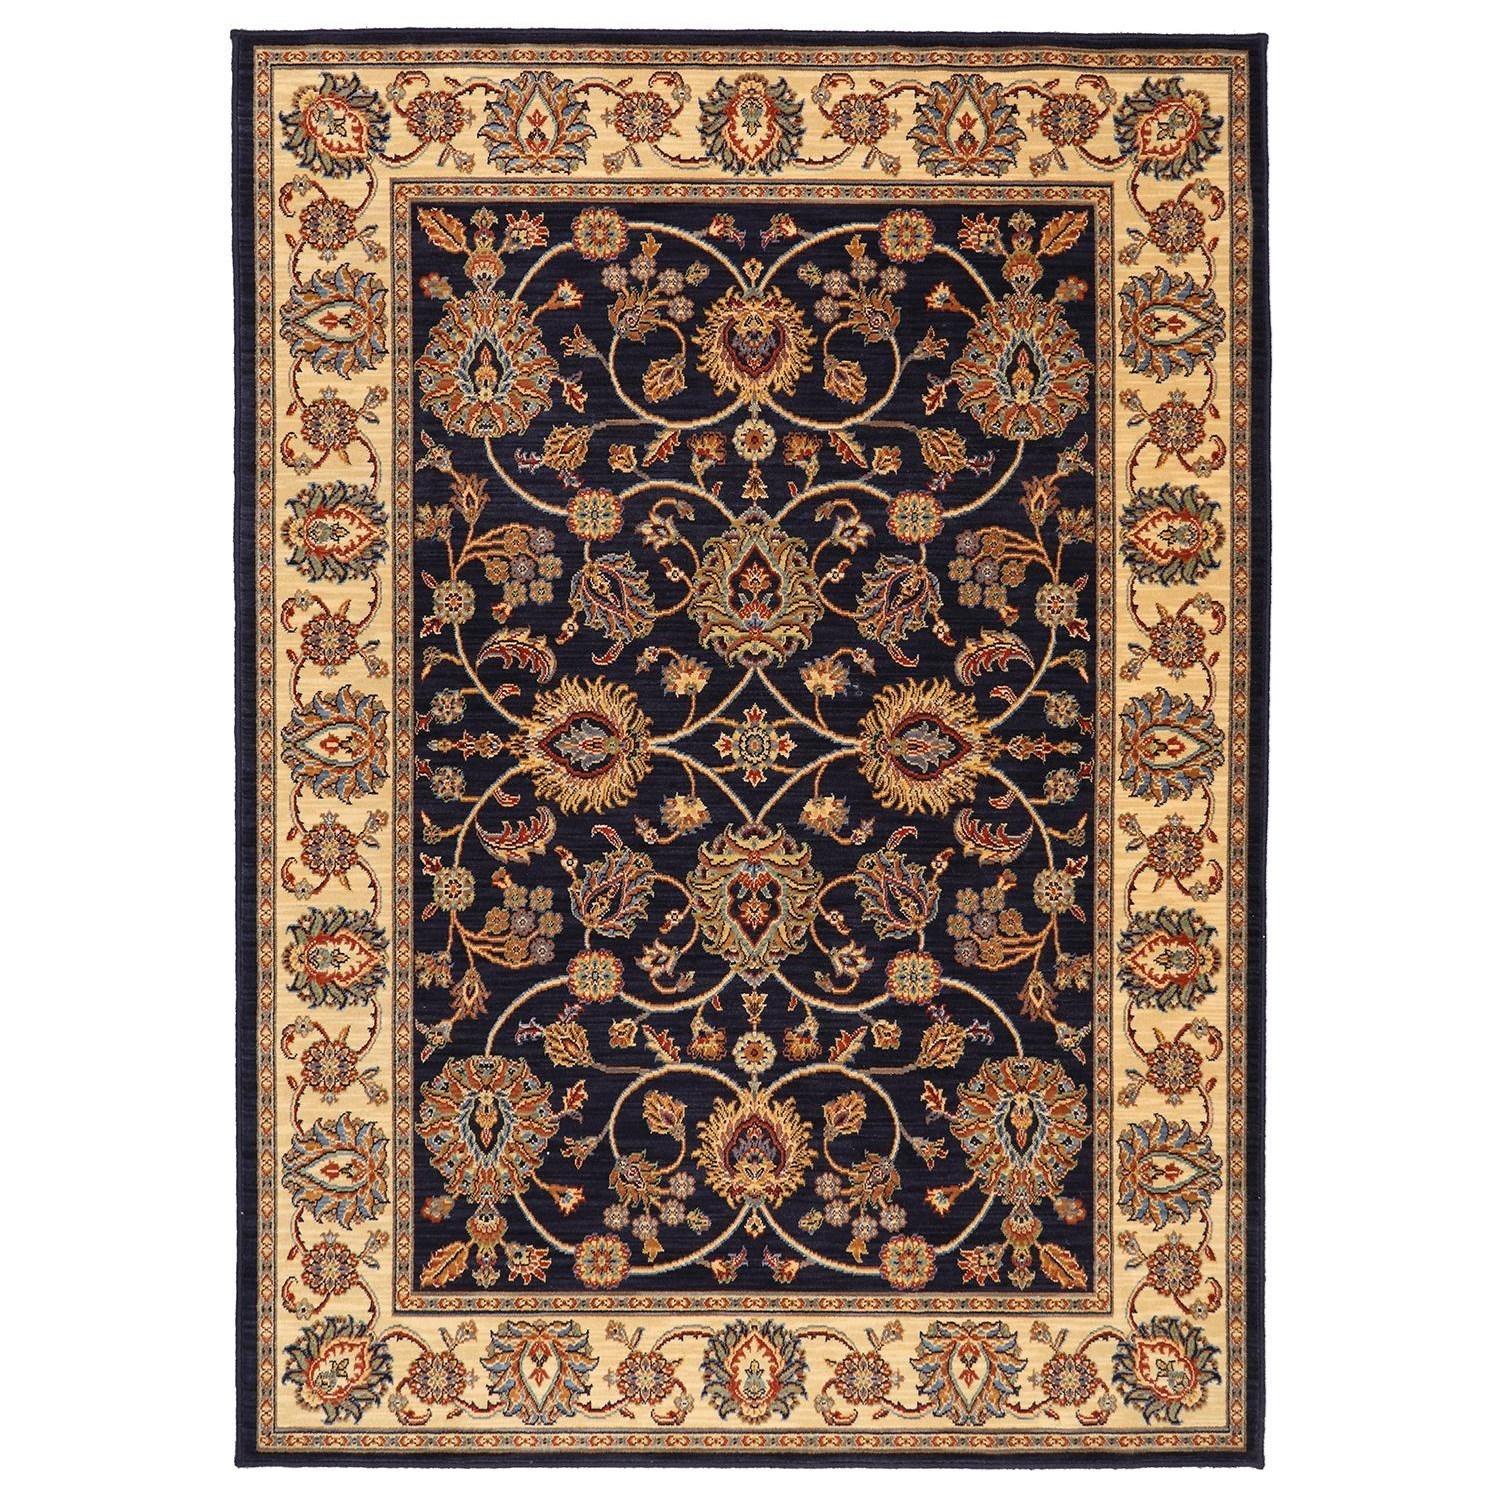 Karastan Rugs English Manor 2'6x12' Oxford Navy Rug Runner - Item Number: 02120 00605 030144